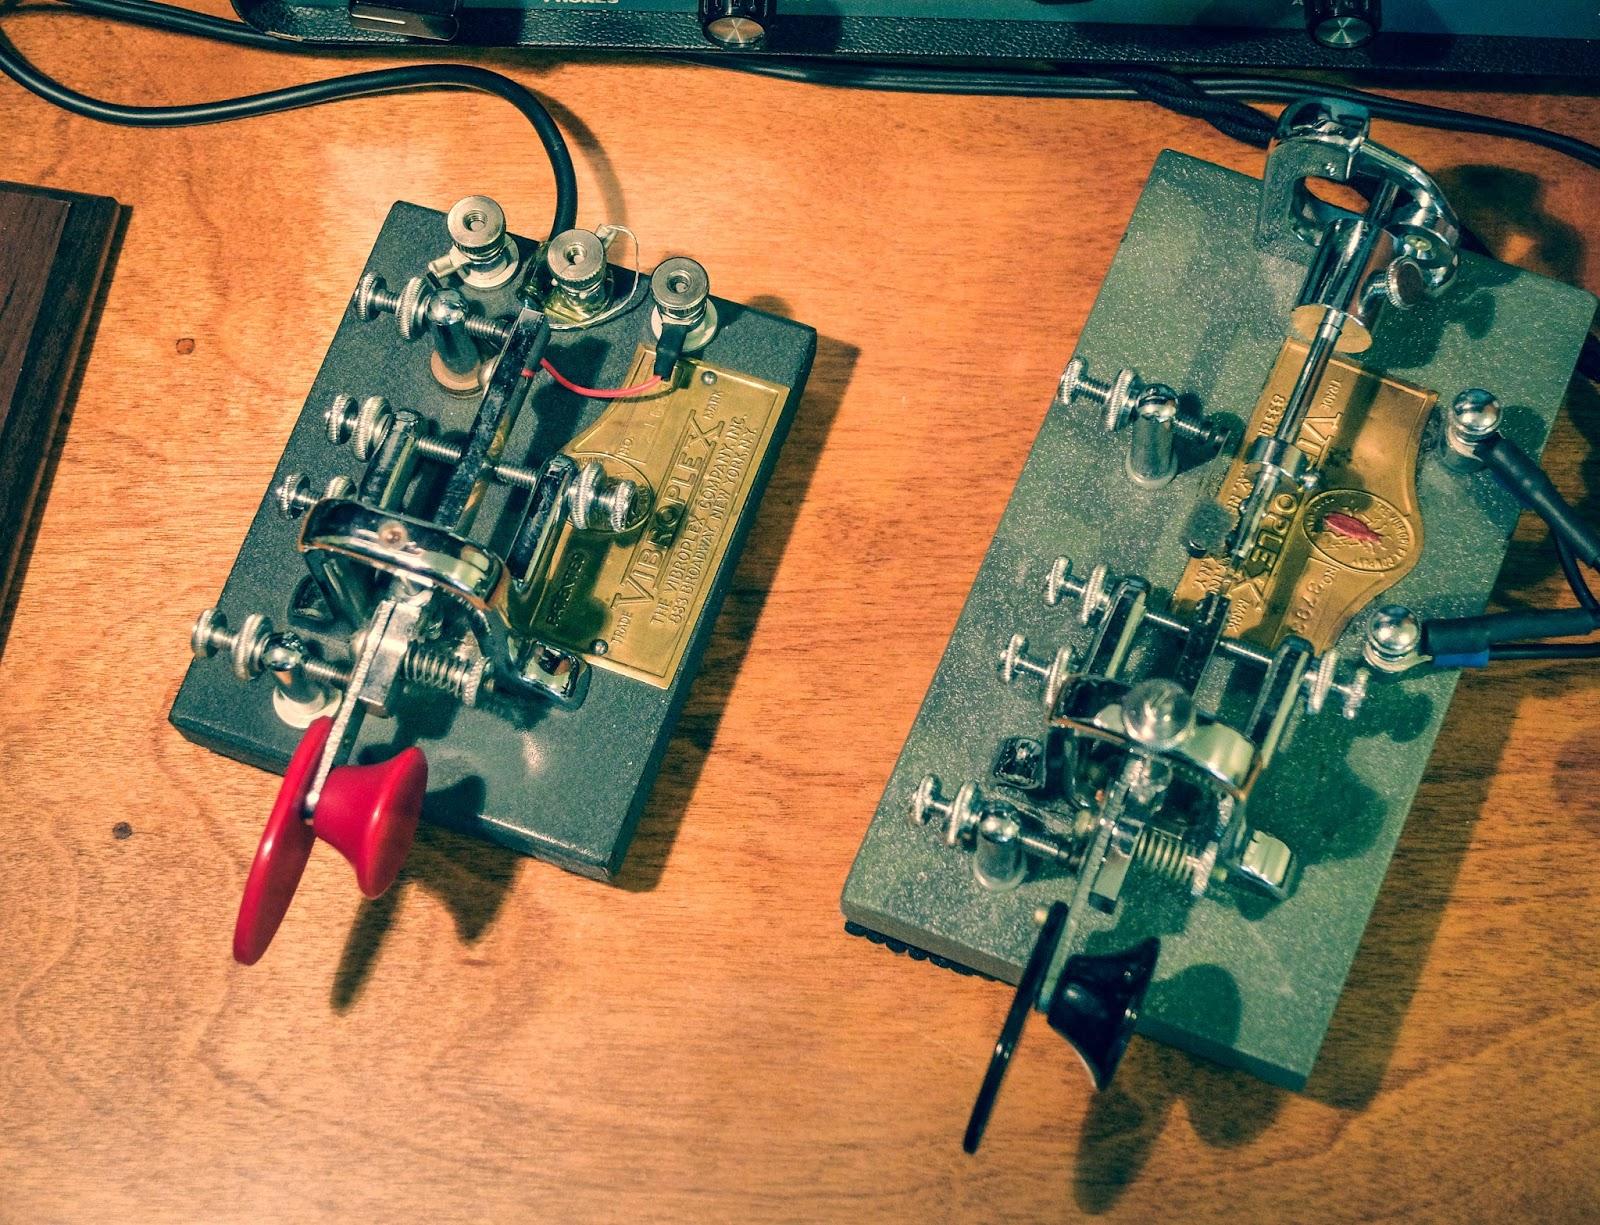 Ham Radio Qrp October 2017 Simple Electronic Keyer Vibrokeyer Next To A Bug